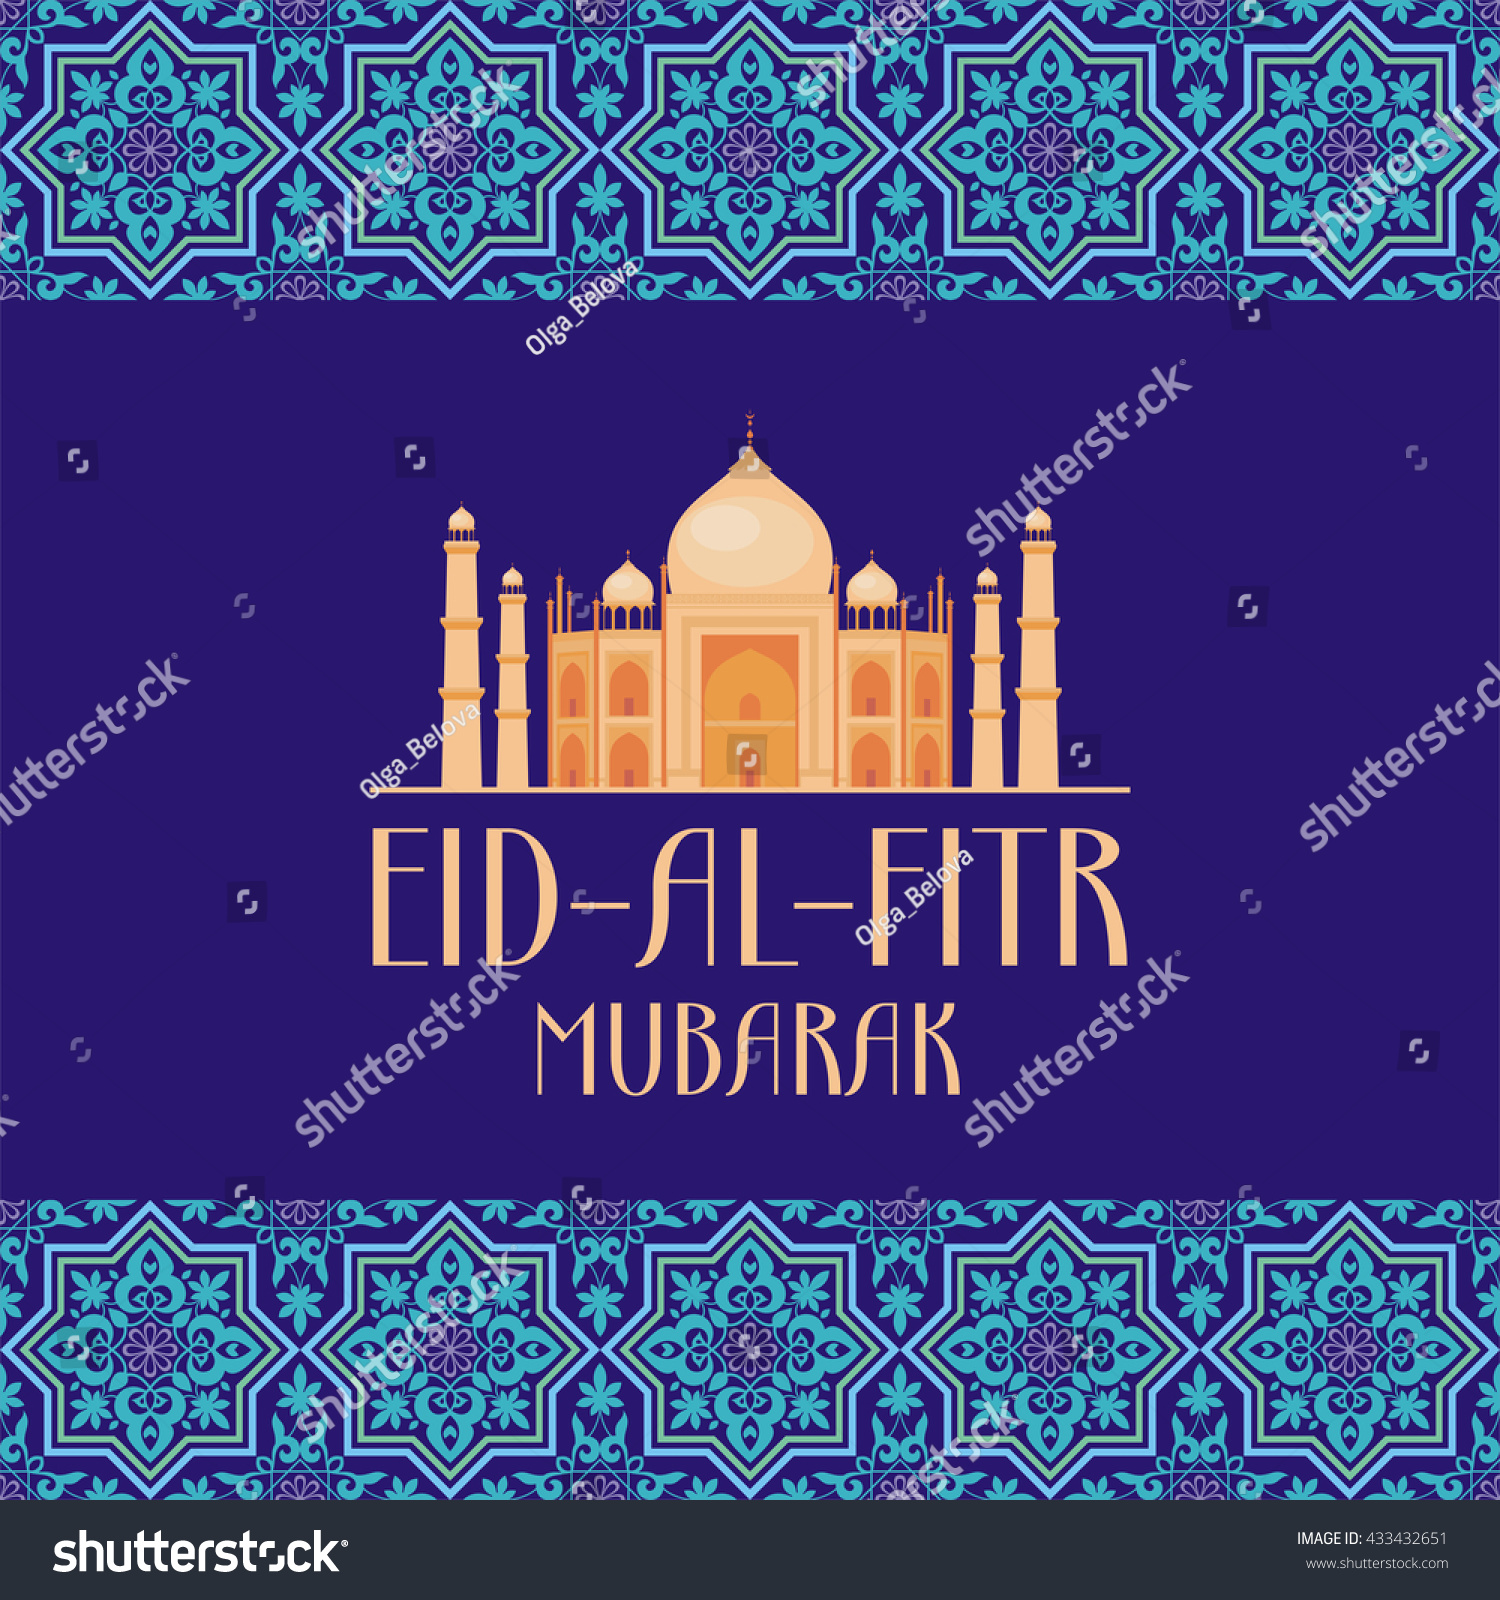 Good Different Eid Al-Fitr Greeting - stock-vector-eid-al-fitr-greeting-card-with-the-image-of-an-mosque-433432651  2018_28841 .jpg